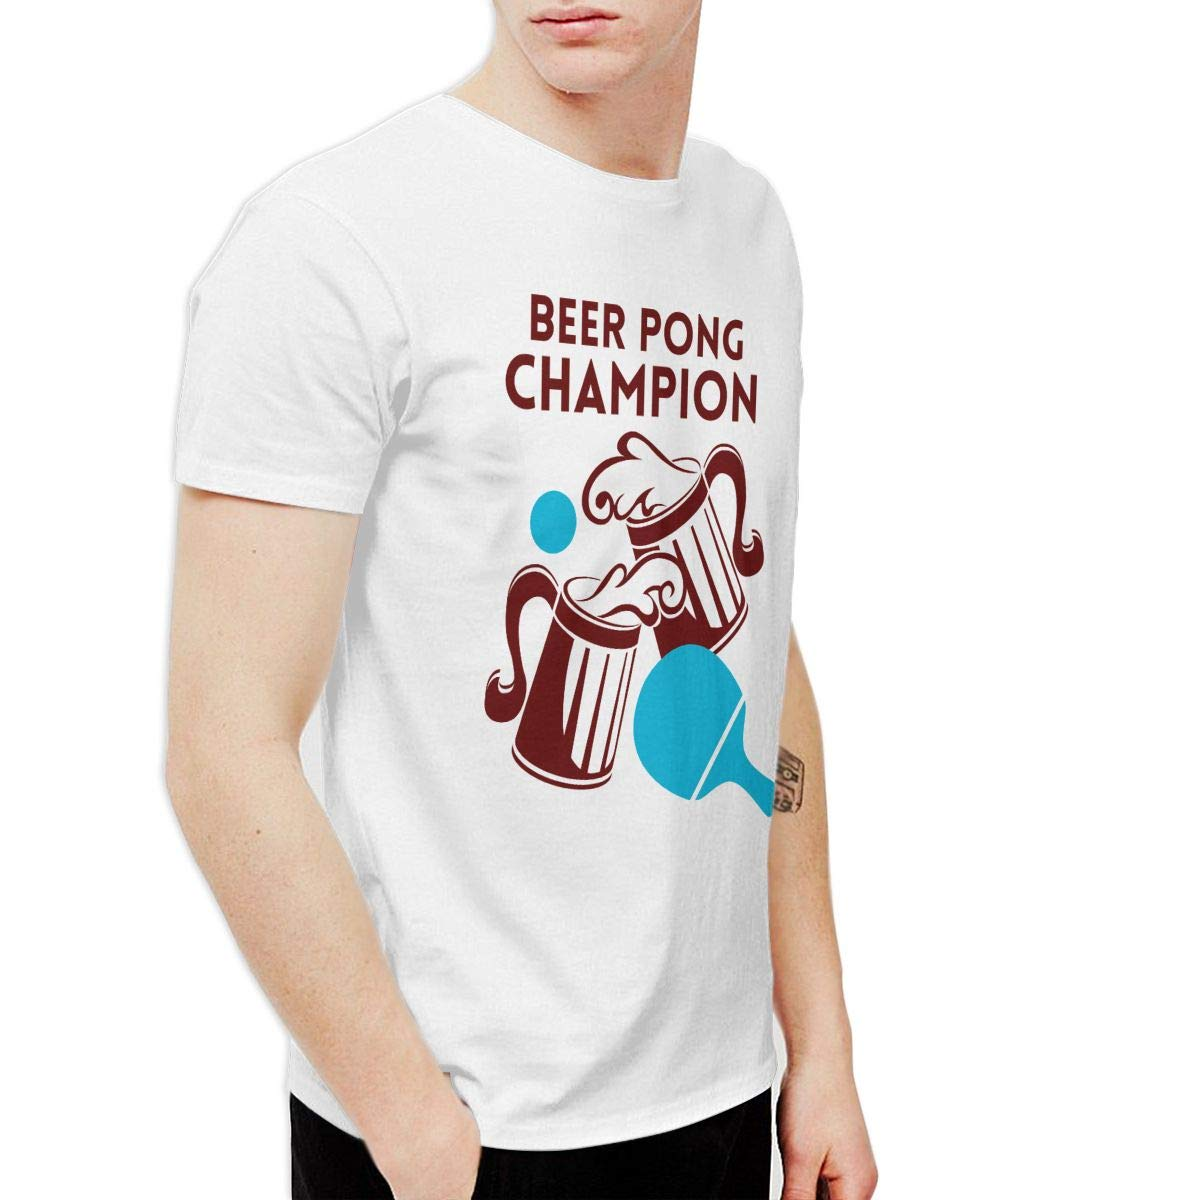 Xiantangrenwang Beer Pong Champion Classic Party Short Sleeve Shirts